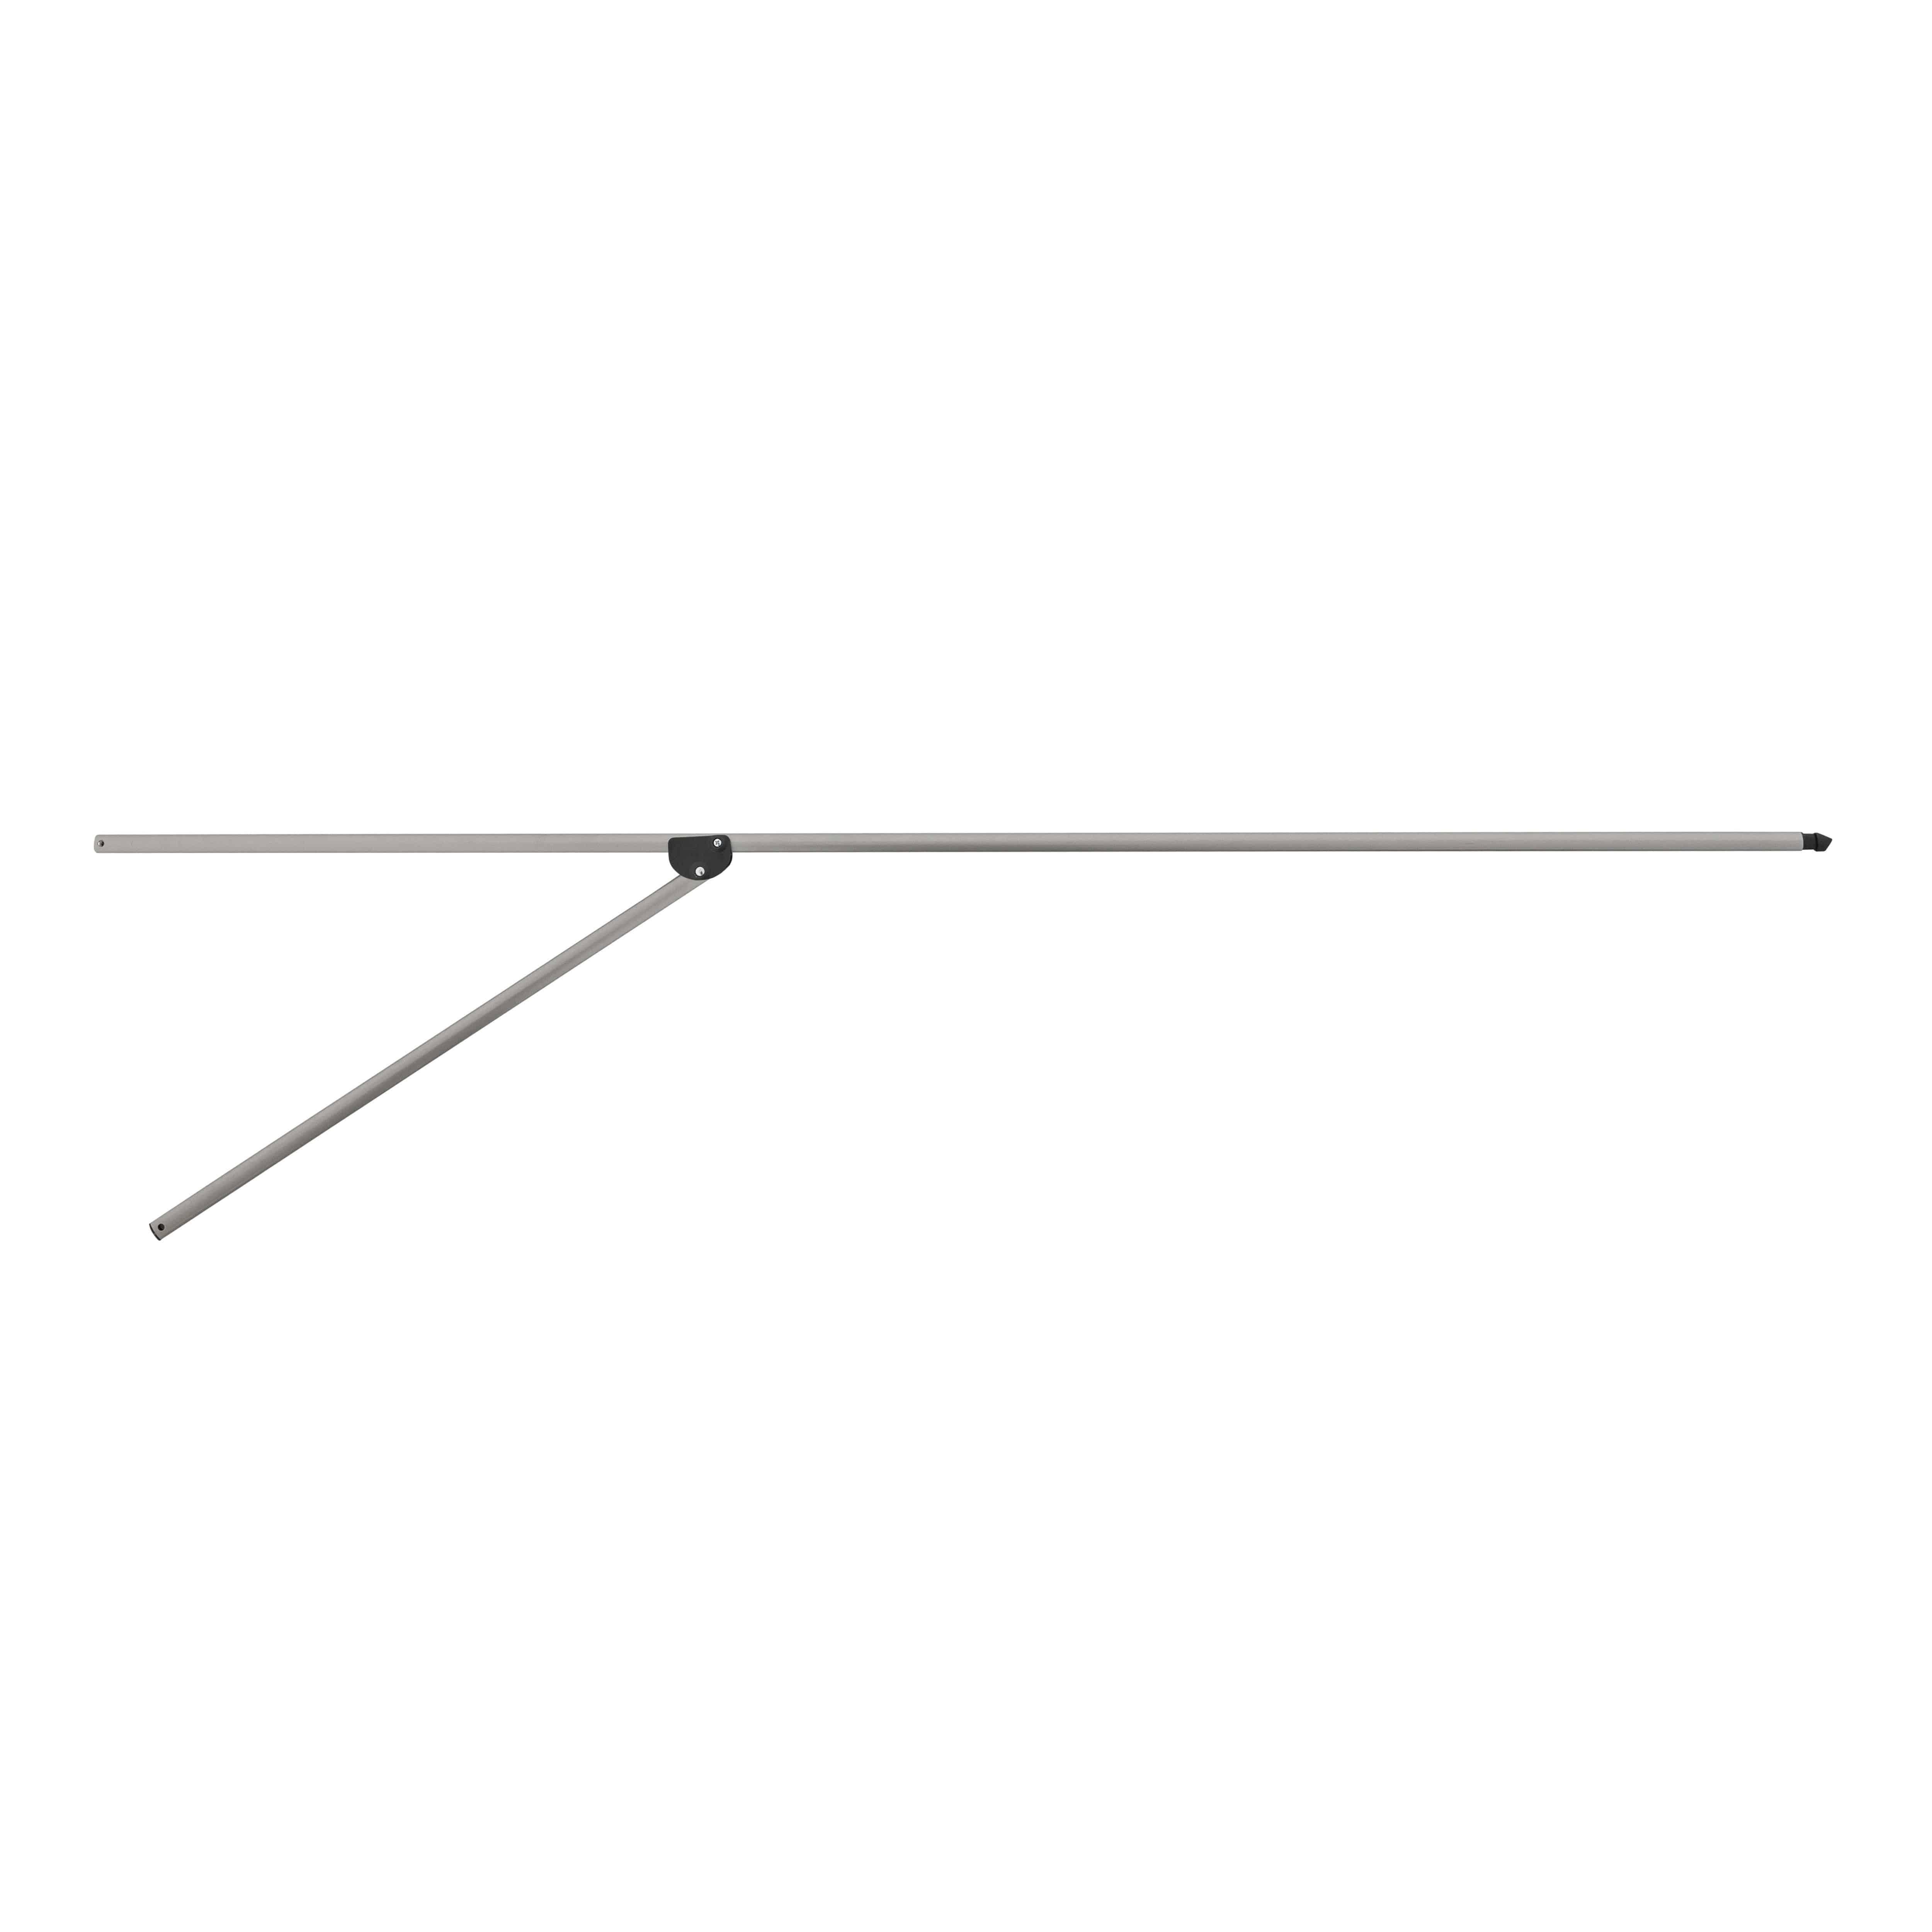 Knirps Strut Strut for parasol Automatic 290